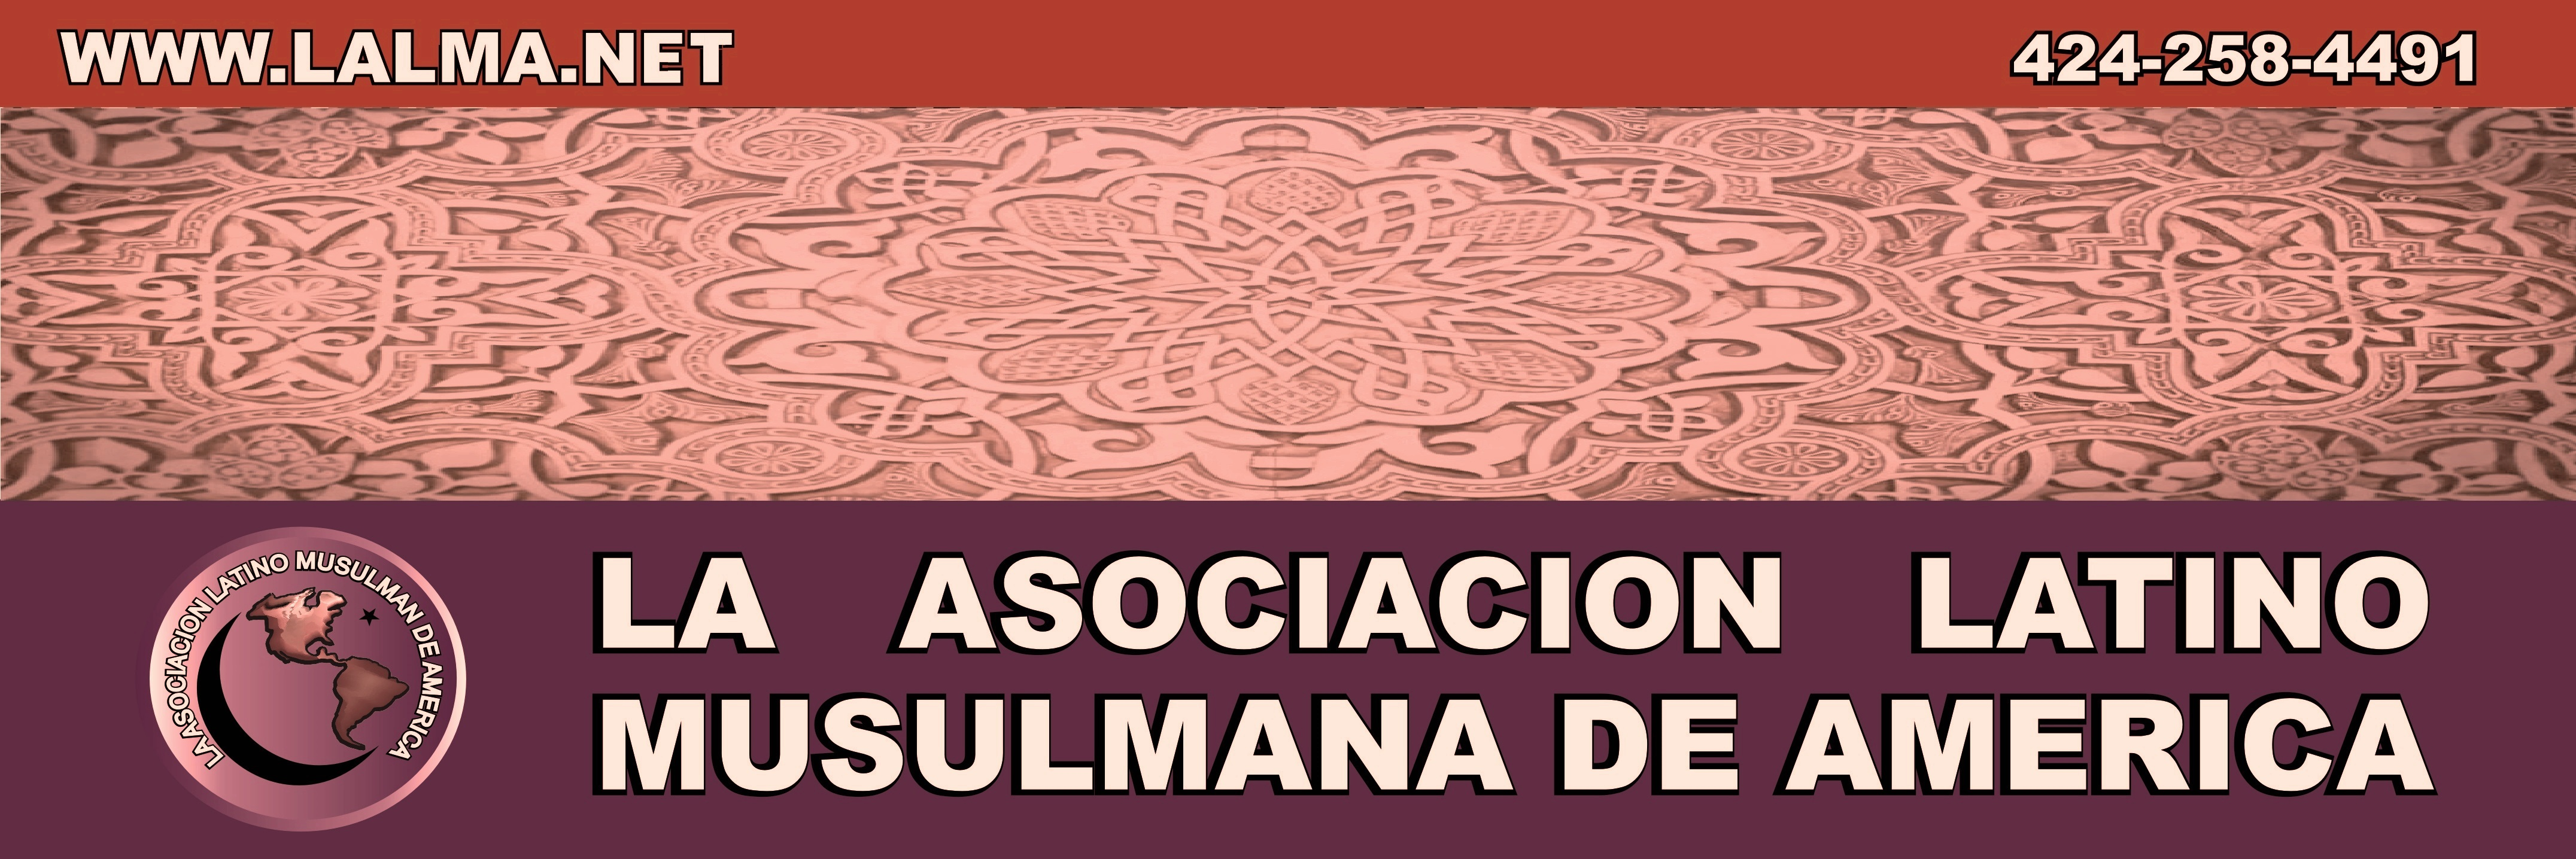 web banner 3